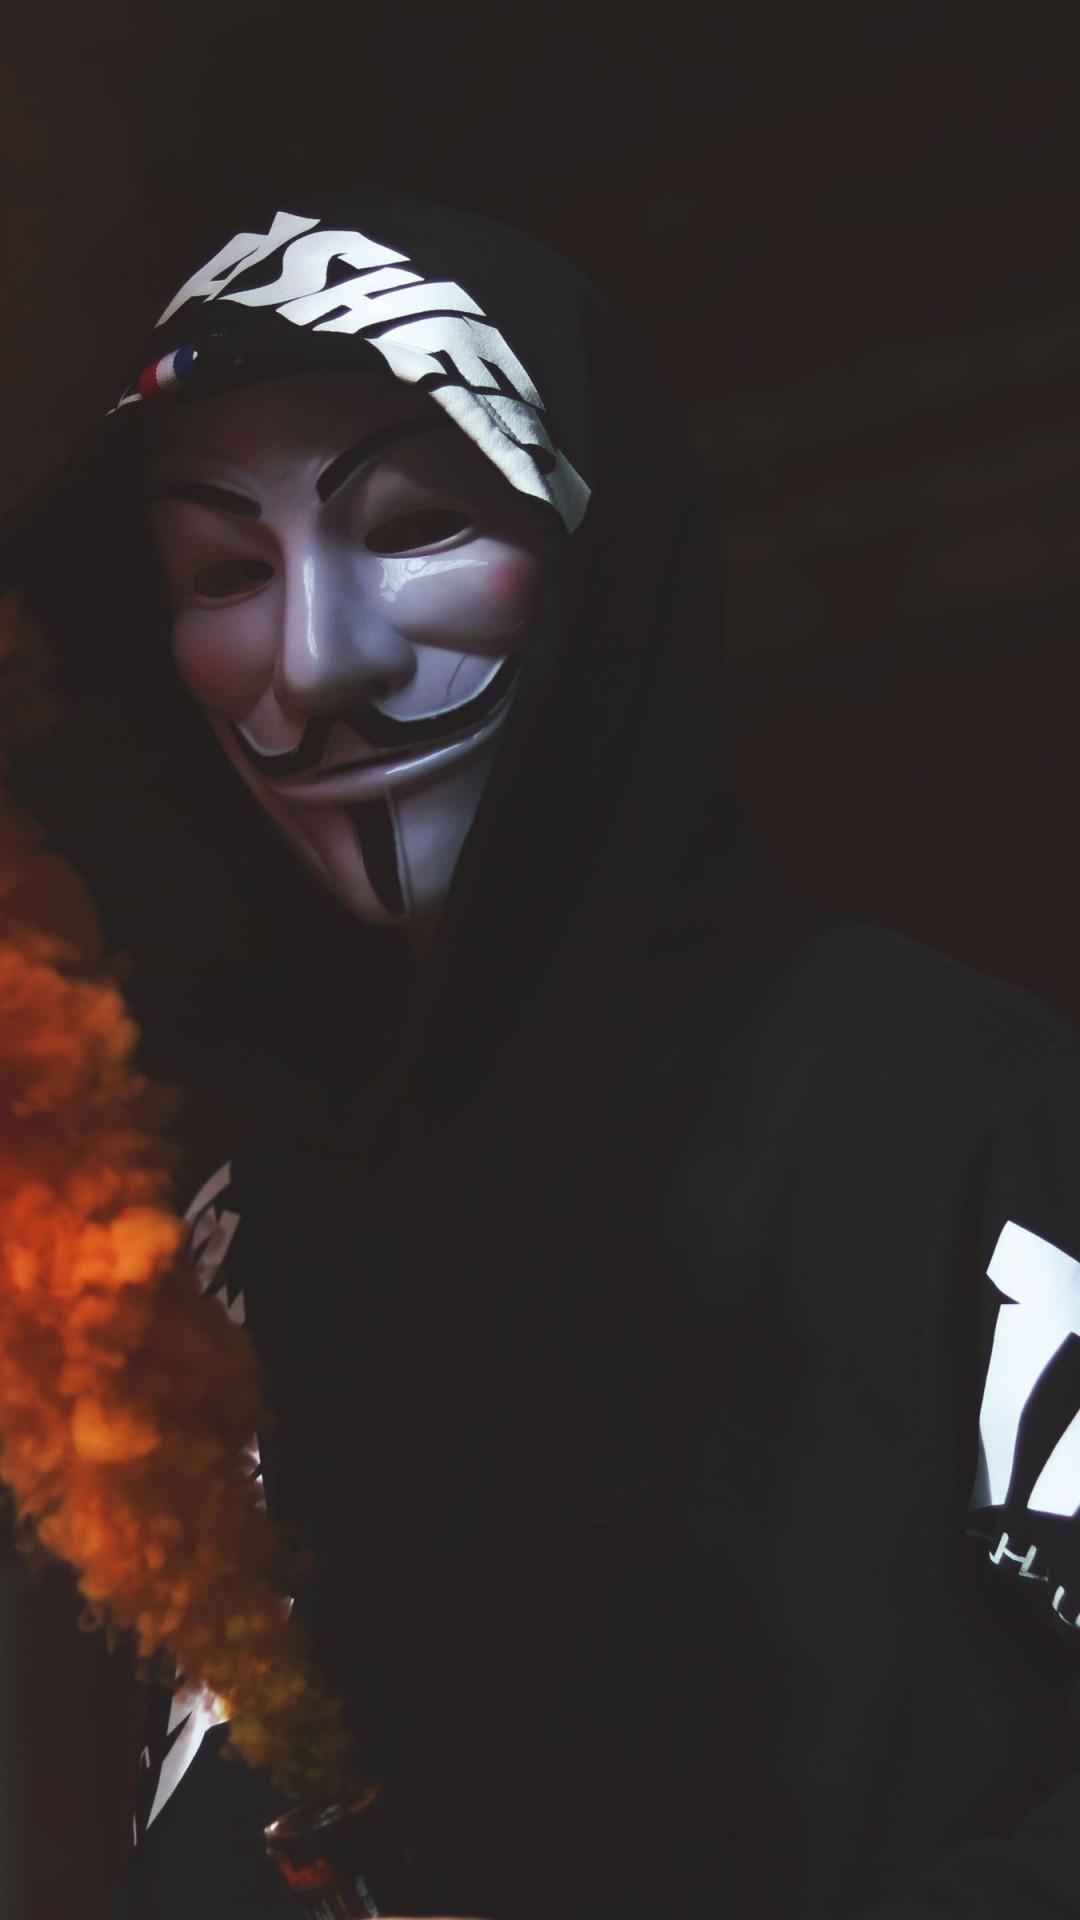 Anonymous mask and orange smoke   1080x1920 wallpaper